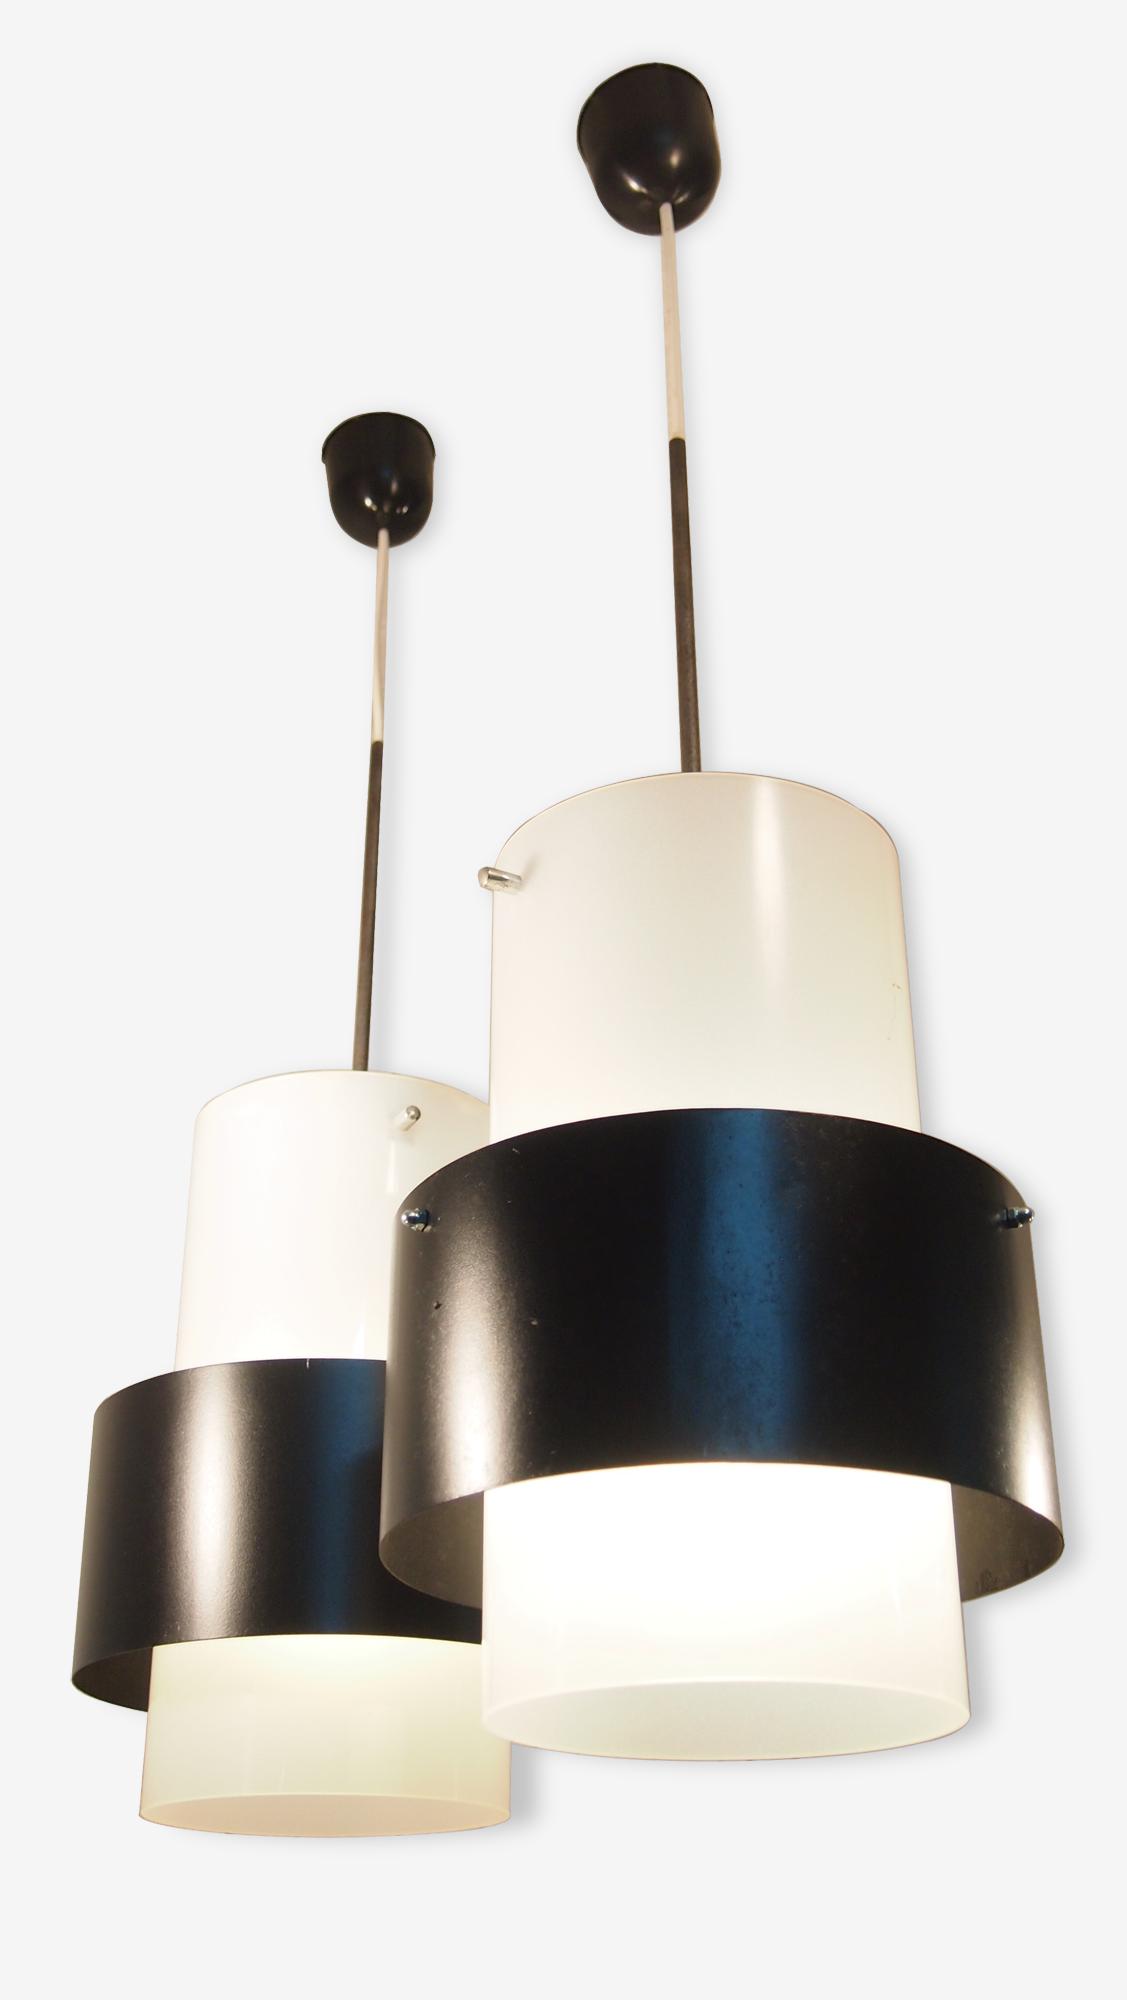 Paire Suspension HAMMERBORG FOG MORUP Lanterne Mid Century Danois Industriel